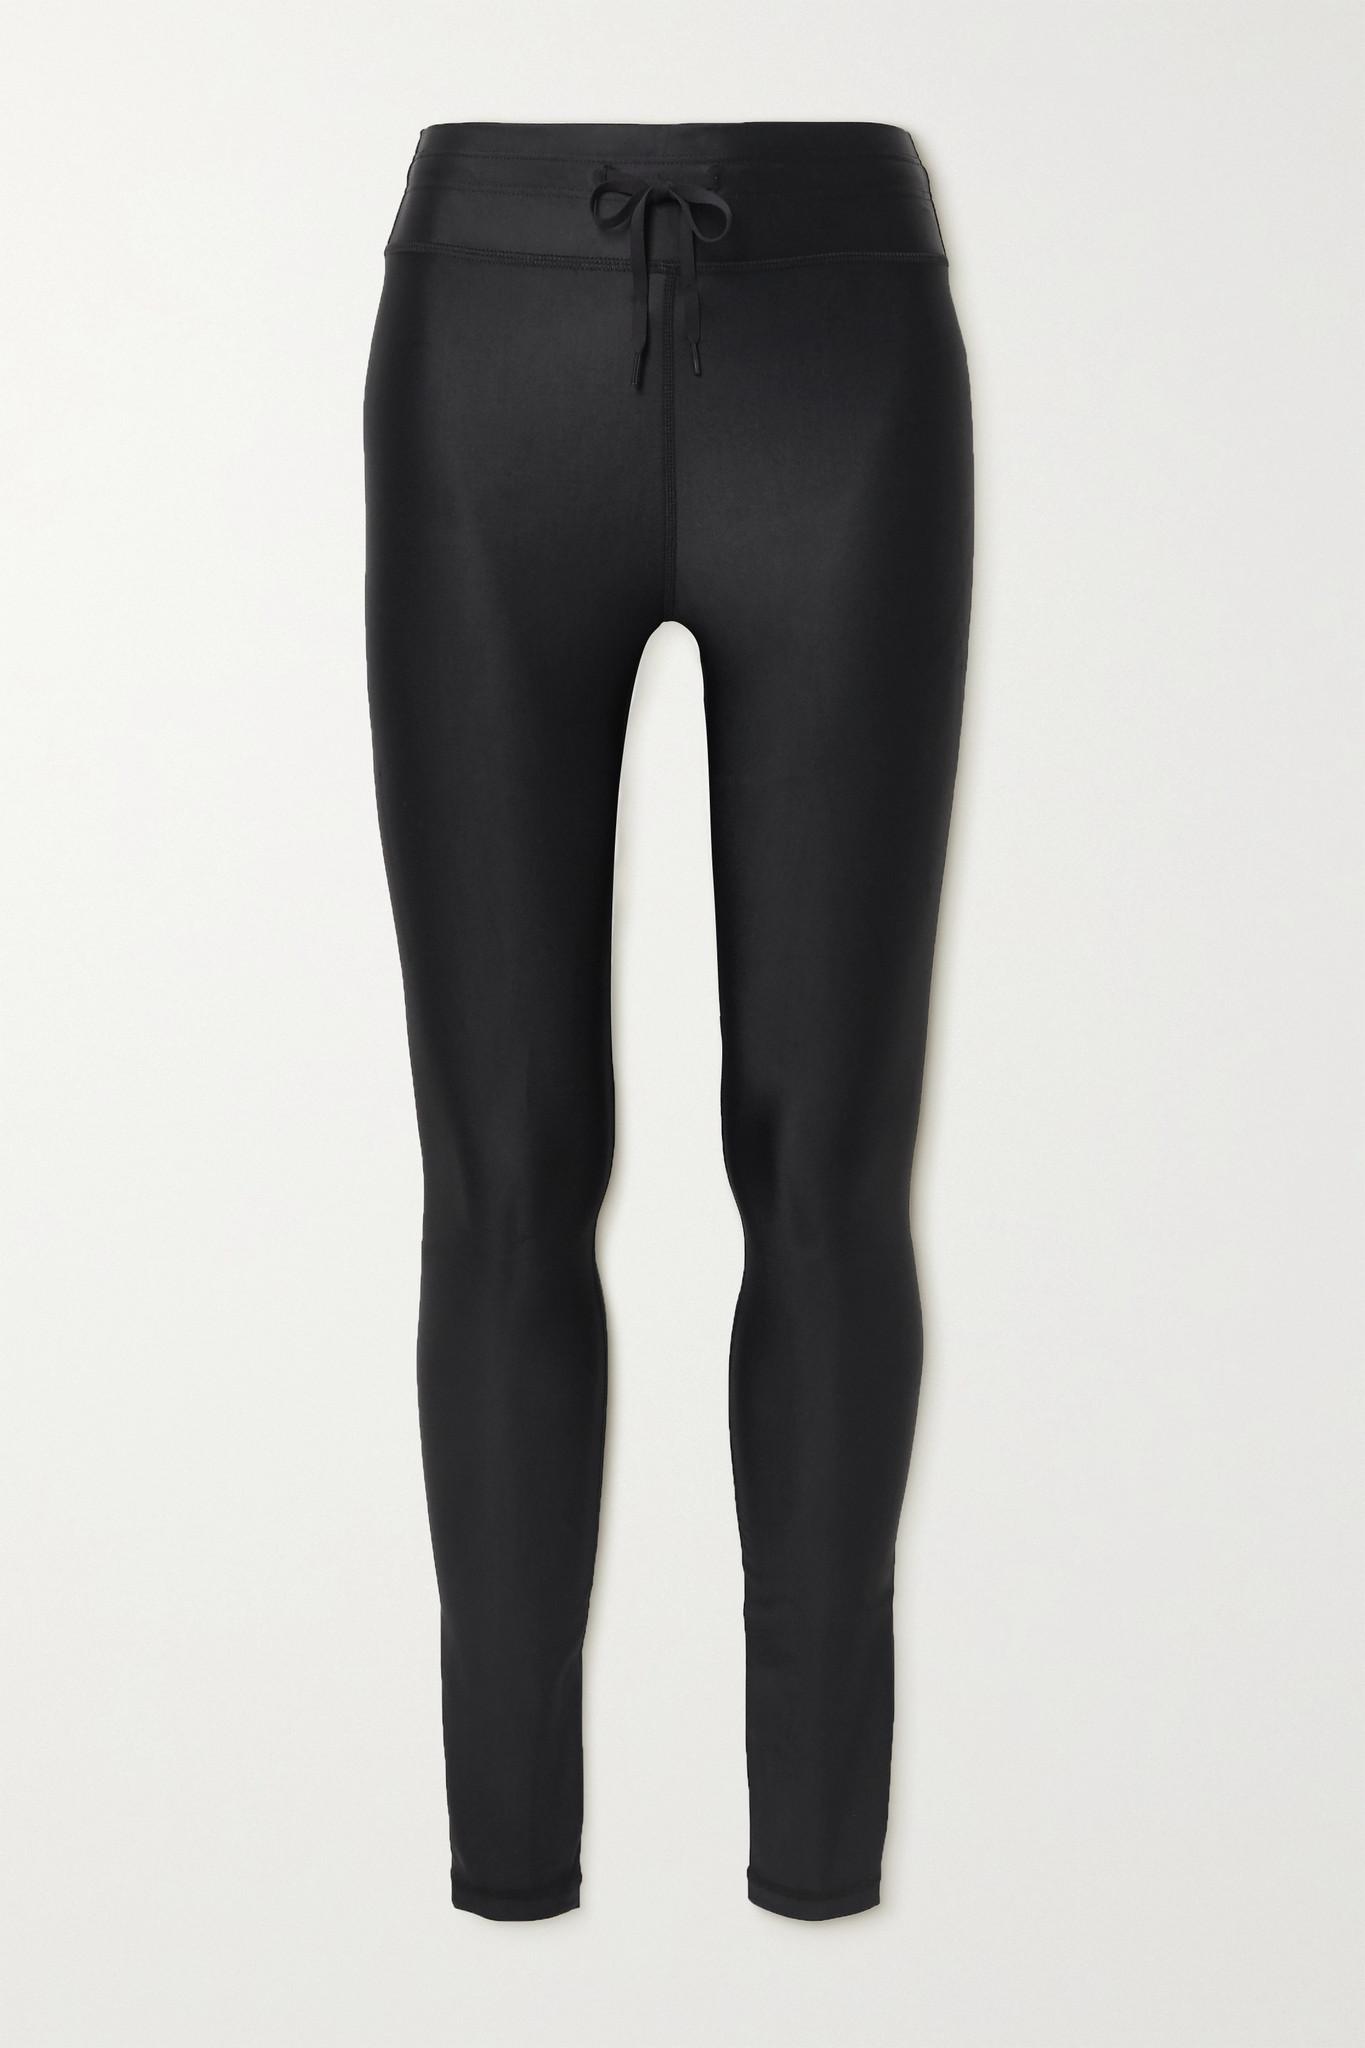 THE UPSIDE - Yoga 弹力紧身运动裤 - 黑色 - large